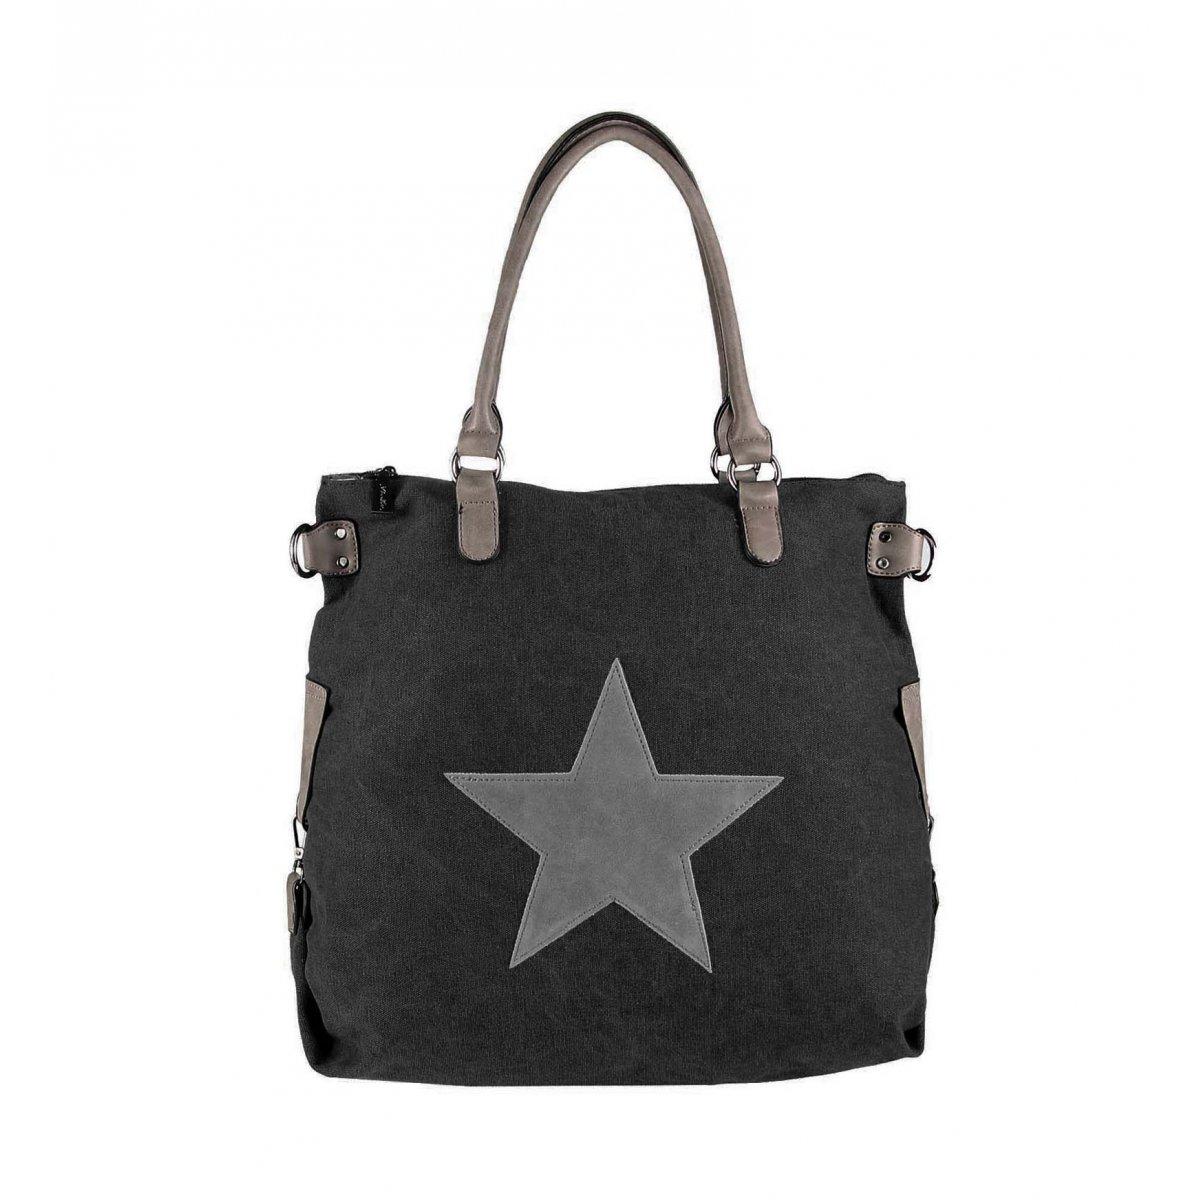 obc ital design din a4 stern tasche handtasche damentasche. Black Bedroom Furniture Sets. Home Design Ideas